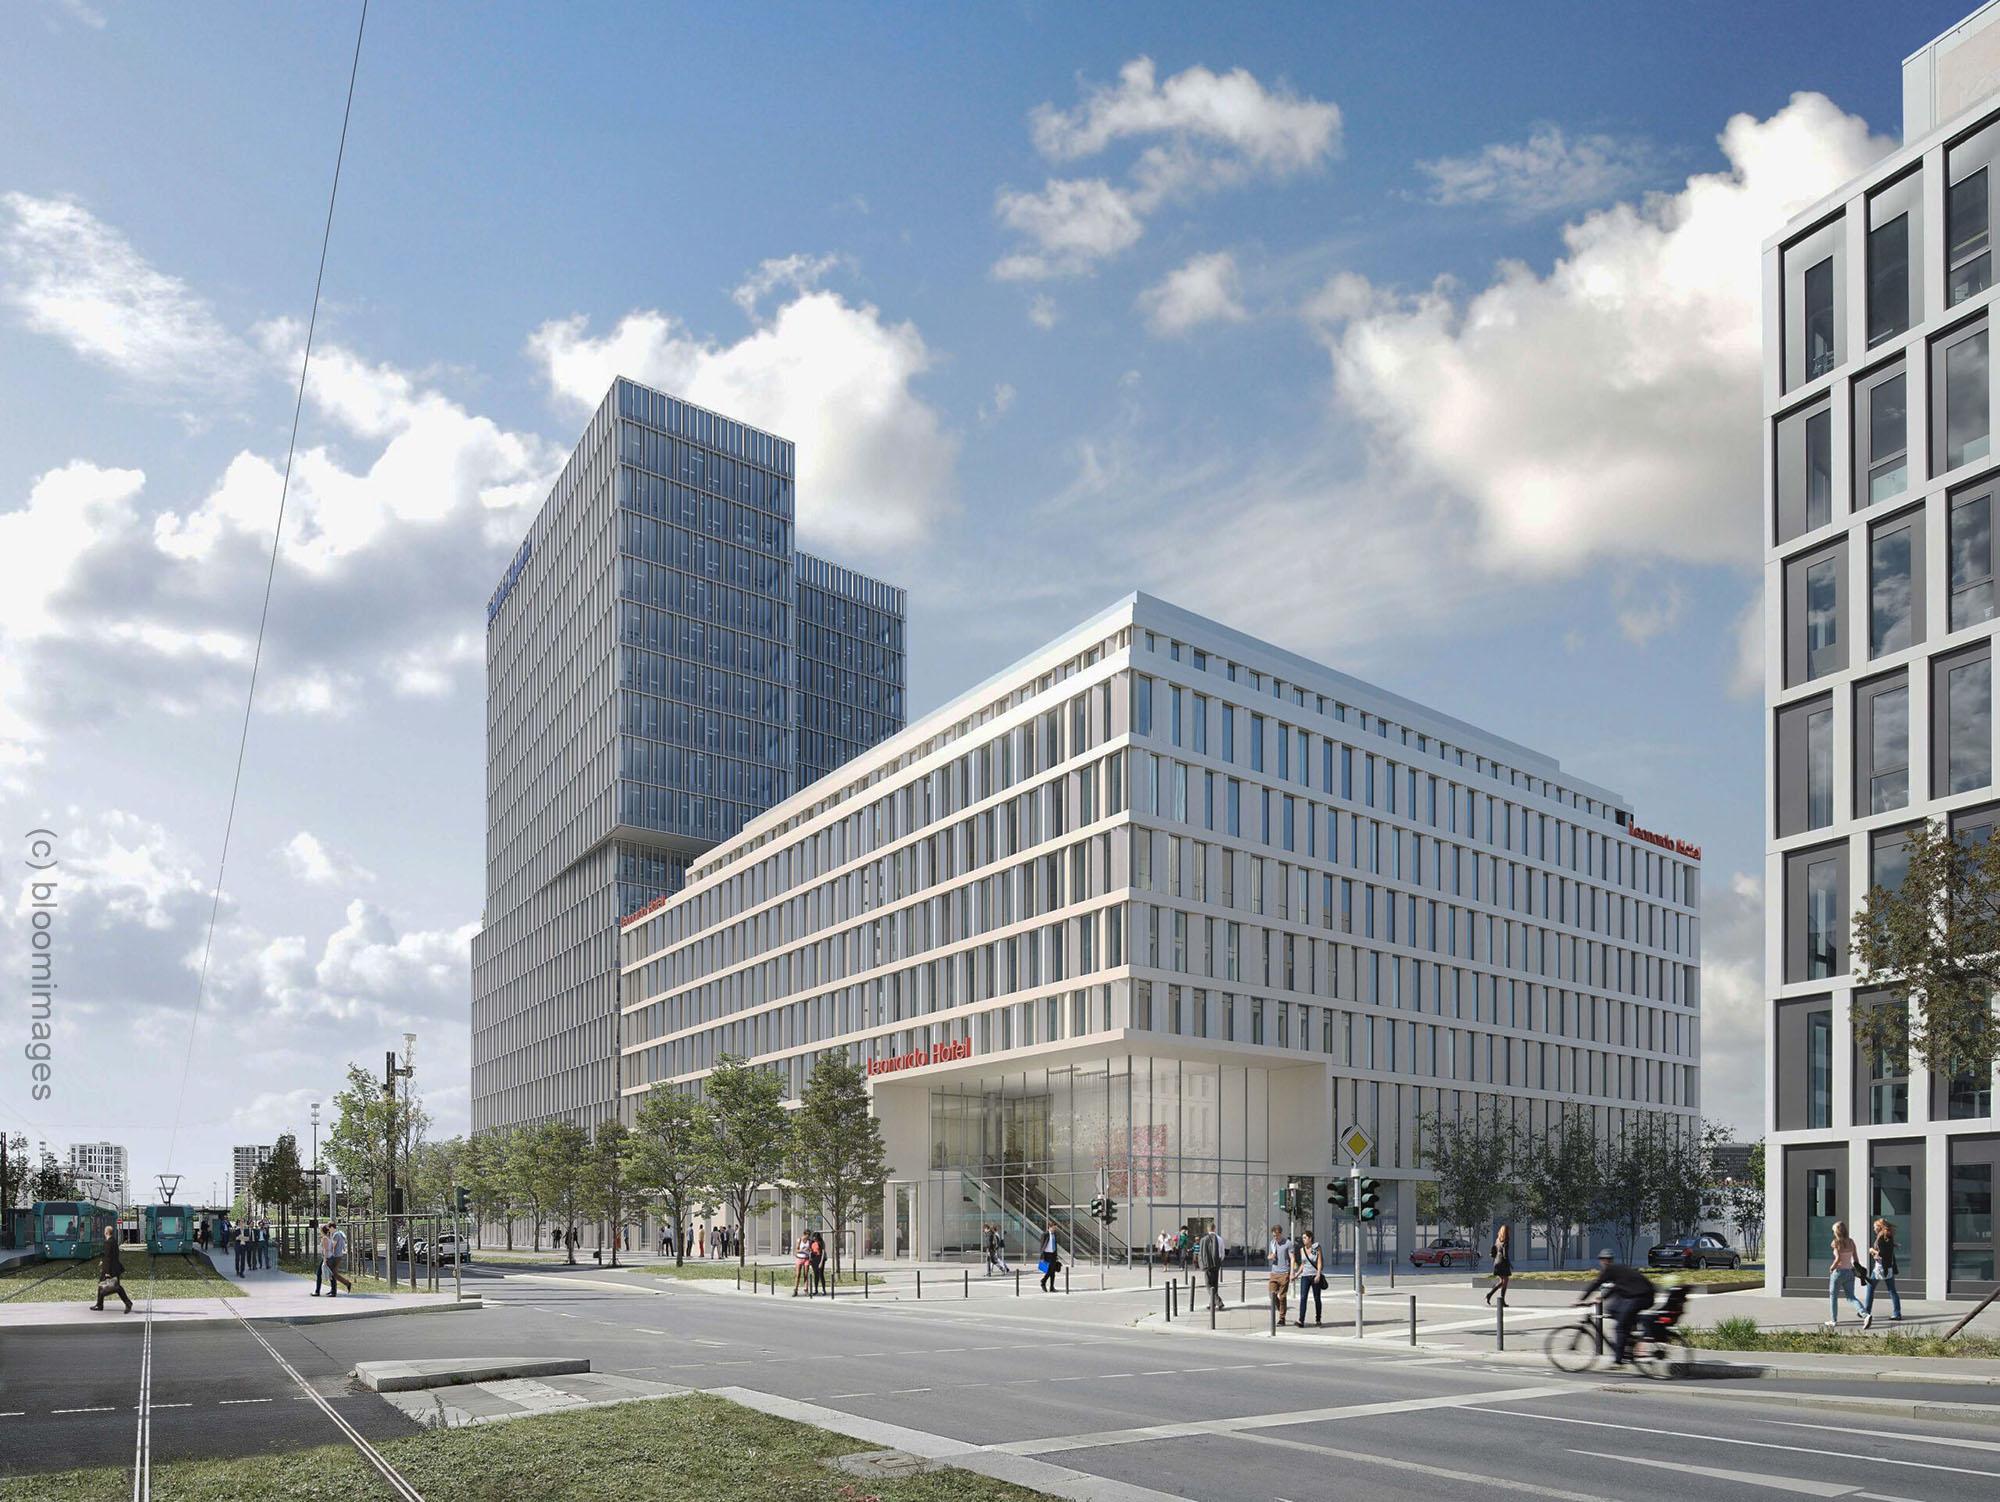 Leonardo Hotel Europaallee am Europagarten - FAZ Tower - Immobilienprojekt Paulus Immobiliengruppe und UBM Development AG in Frankfurt am Main